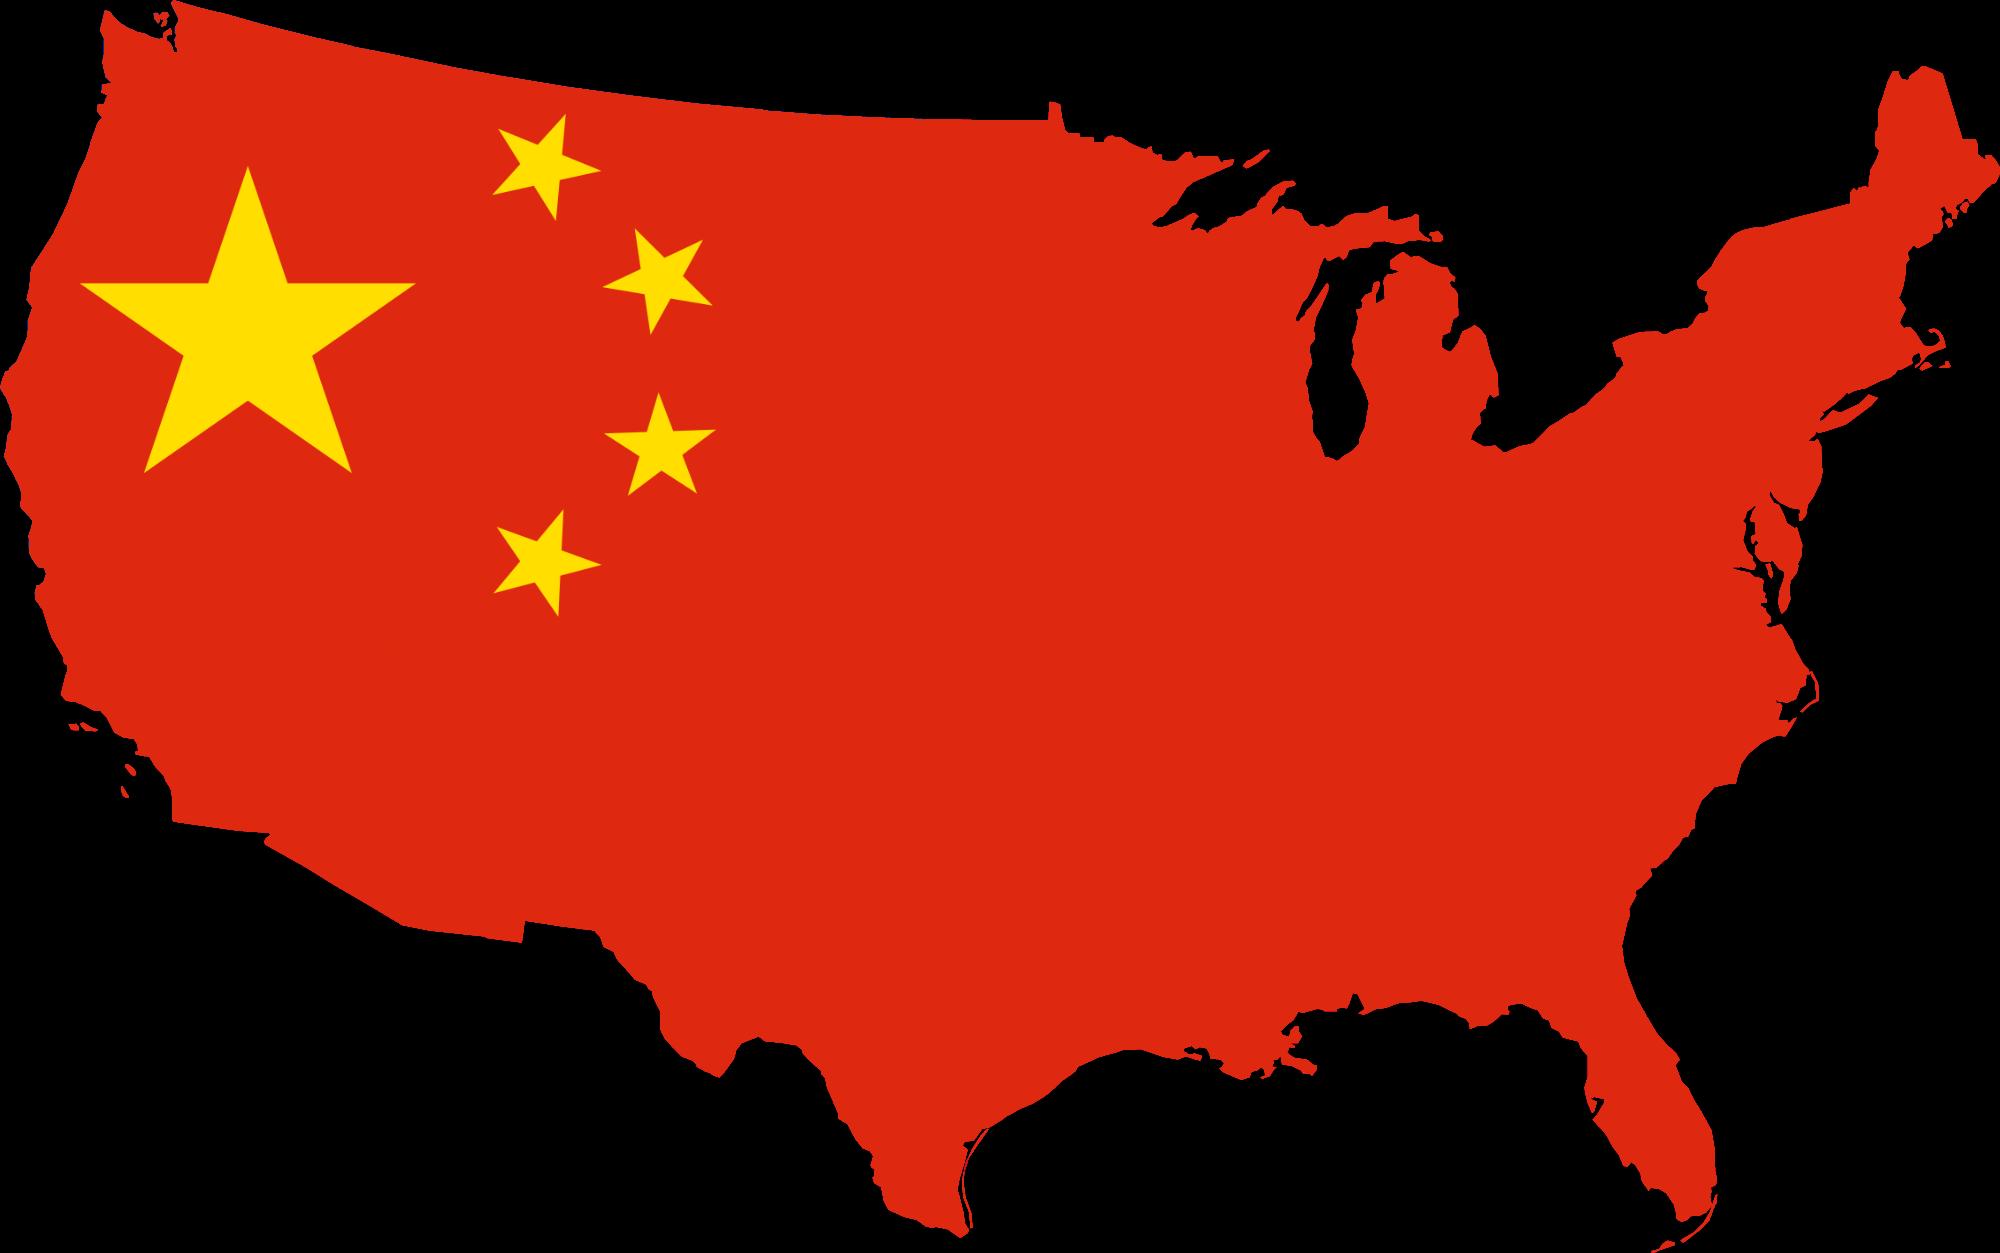 China Map Vector At Getdrawings Com Free For Personal Use China